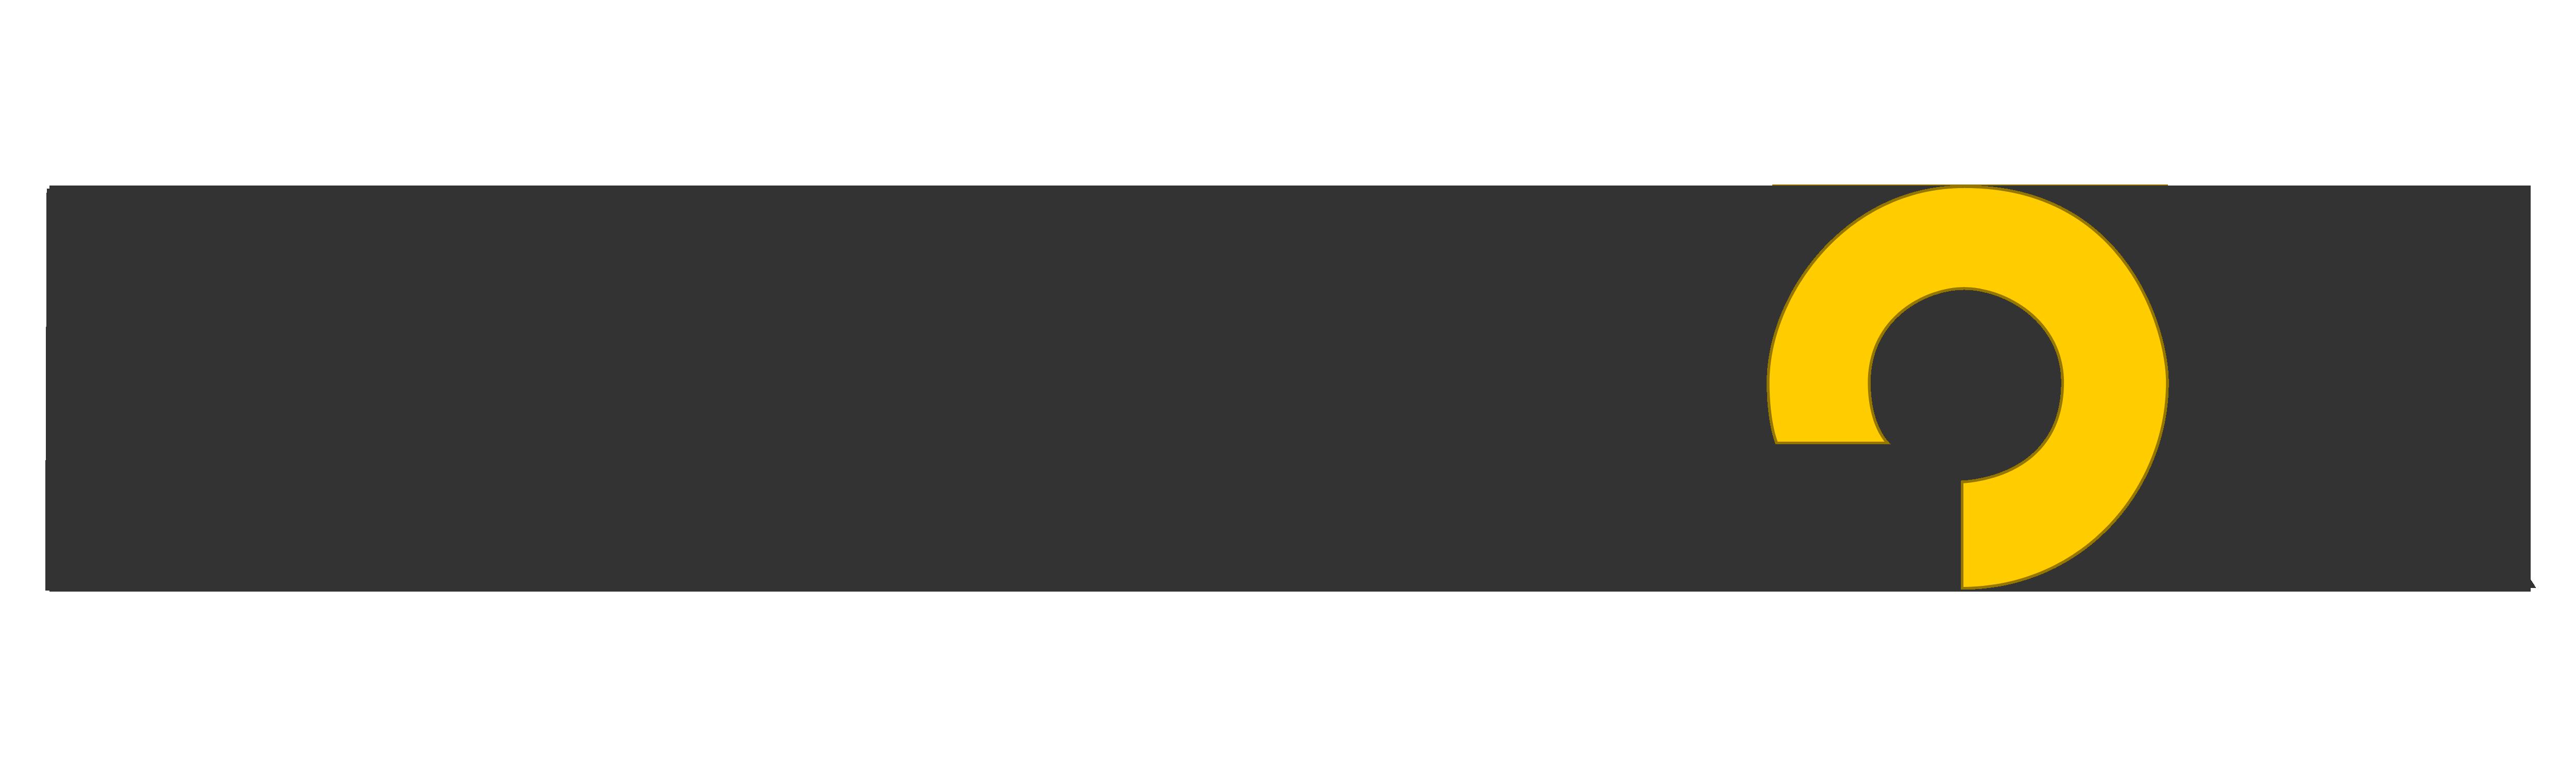 exablox-logo-black